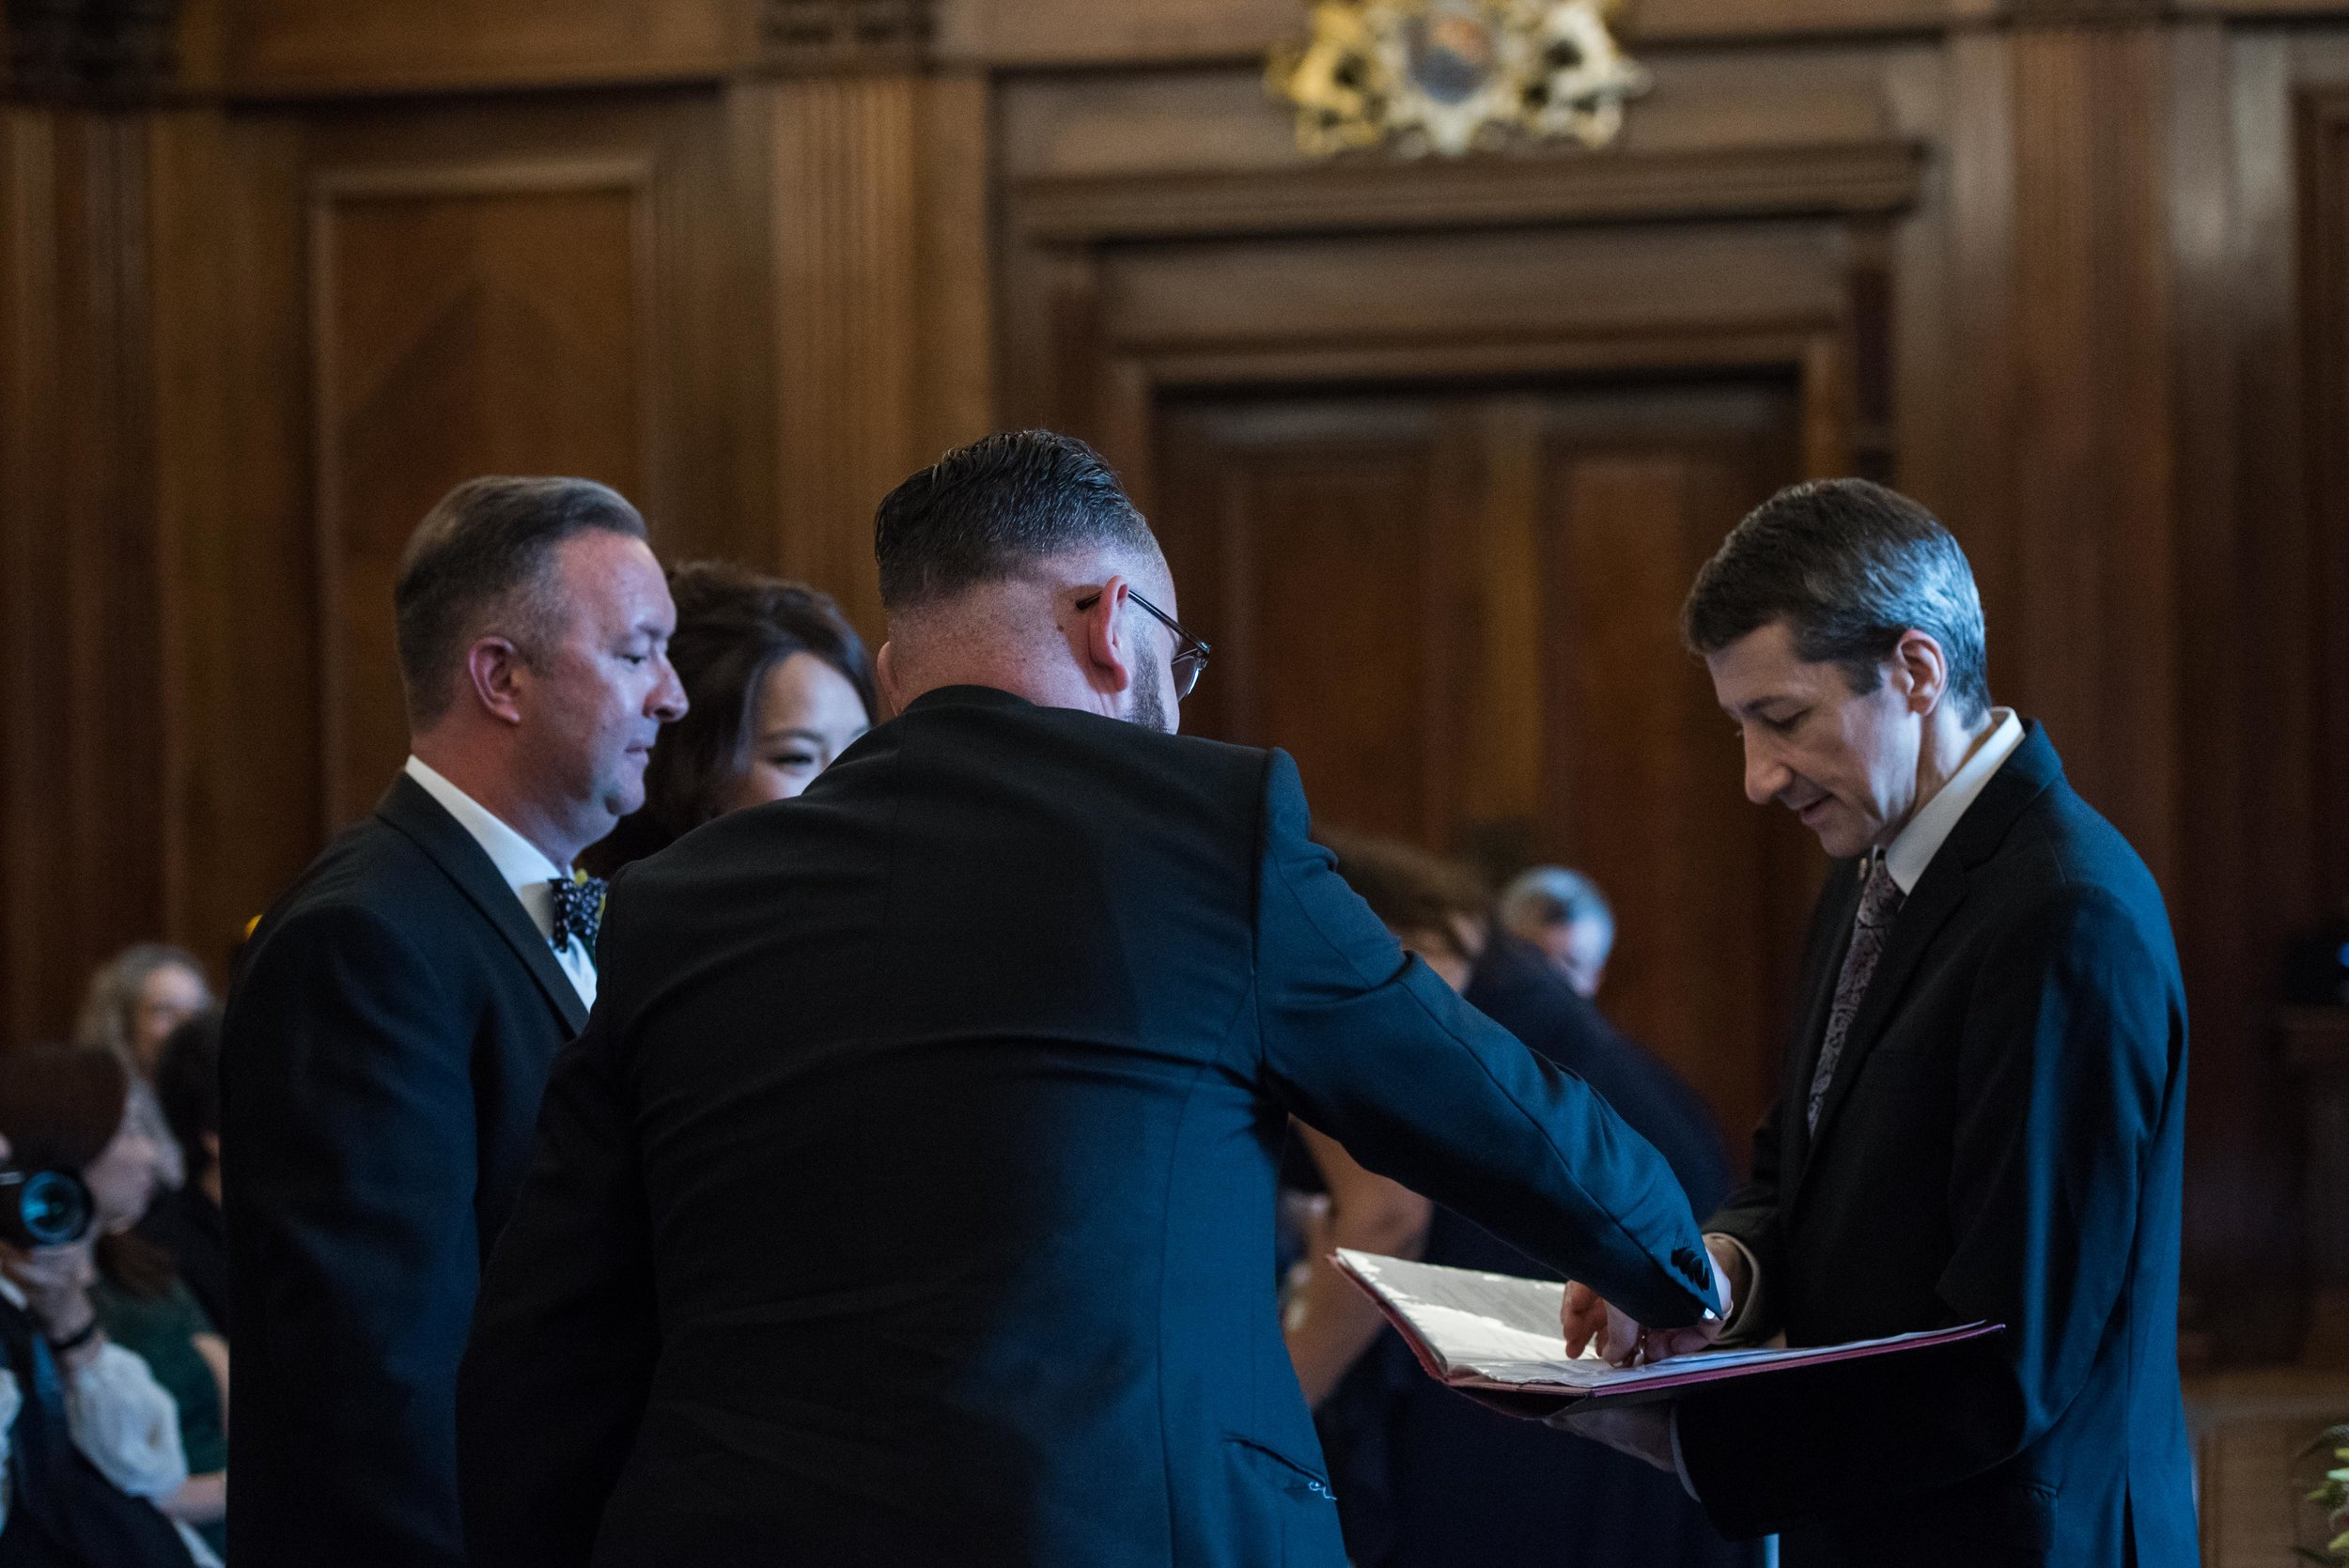 D&M_Marylebone Town Hall Wedding (99 of 239).jpg